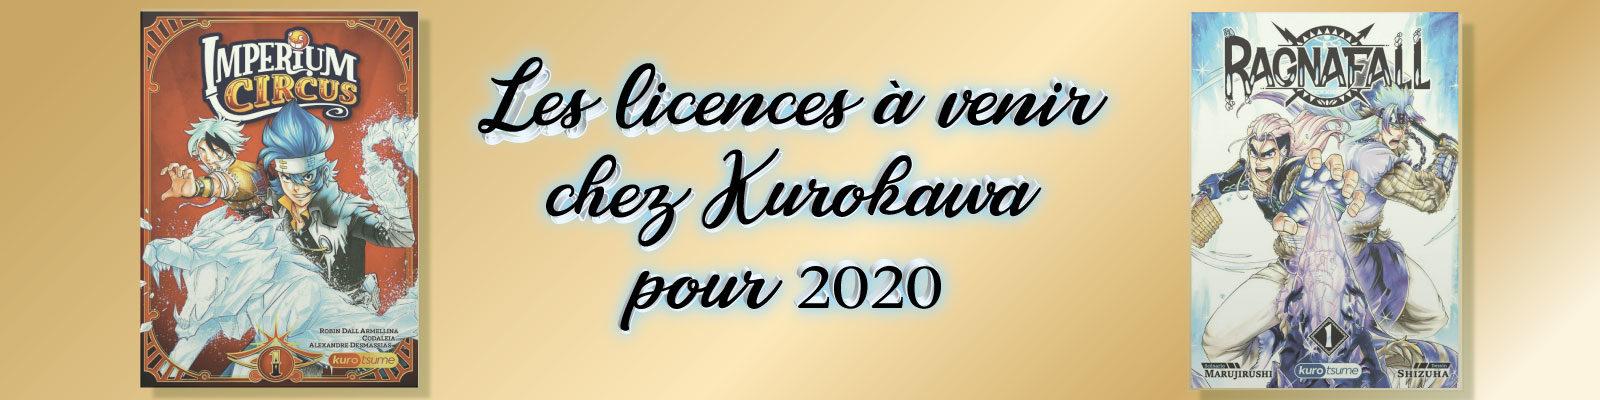 les-licences-à-venir-kurokawa